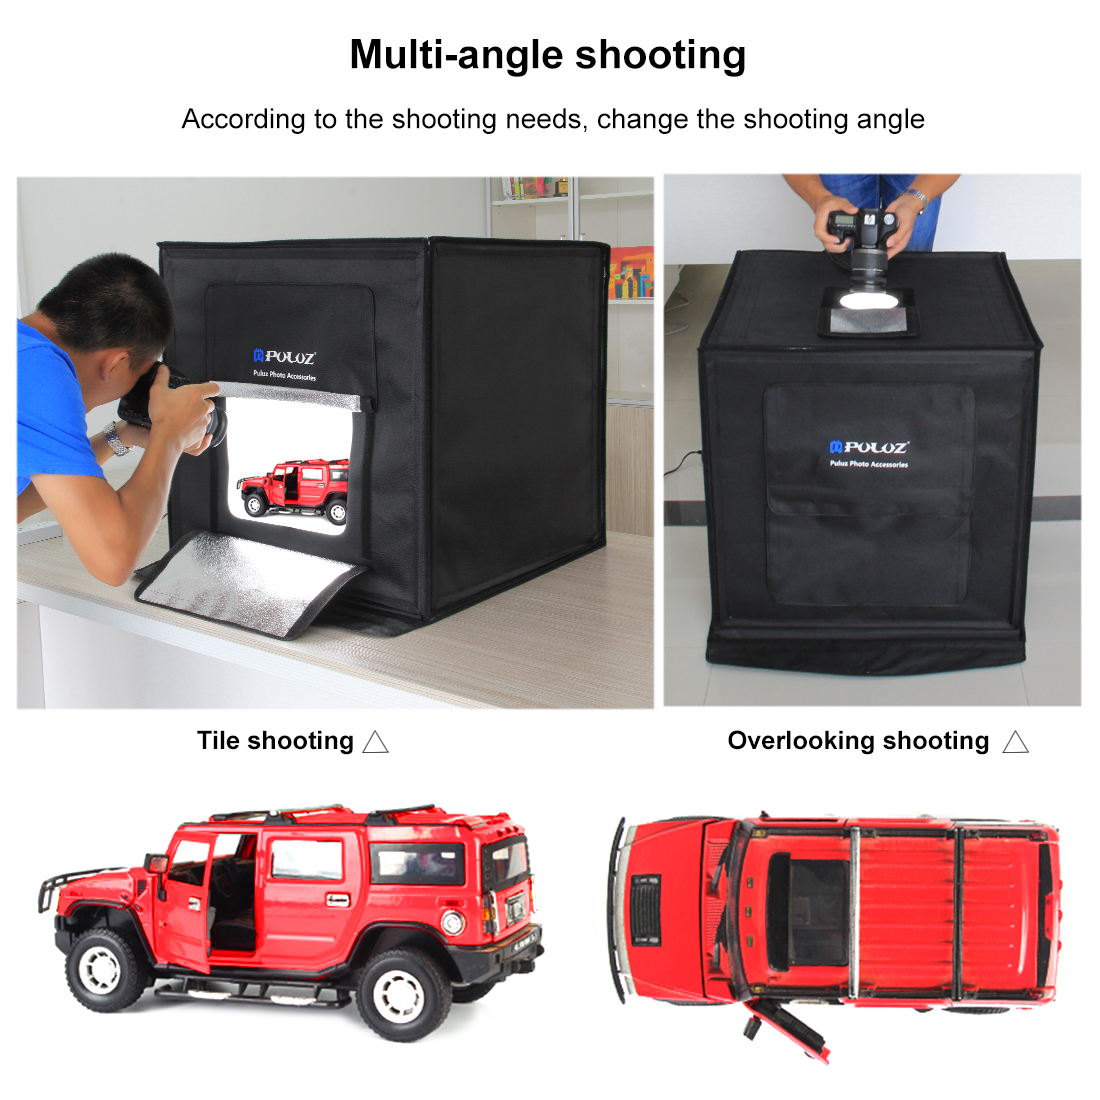 PULUZ Camera Accessory Lightbox 60*60cm LED Photo Studio Softbox Shooting Light Tent AU Plug Power Adapter Compatible with AU